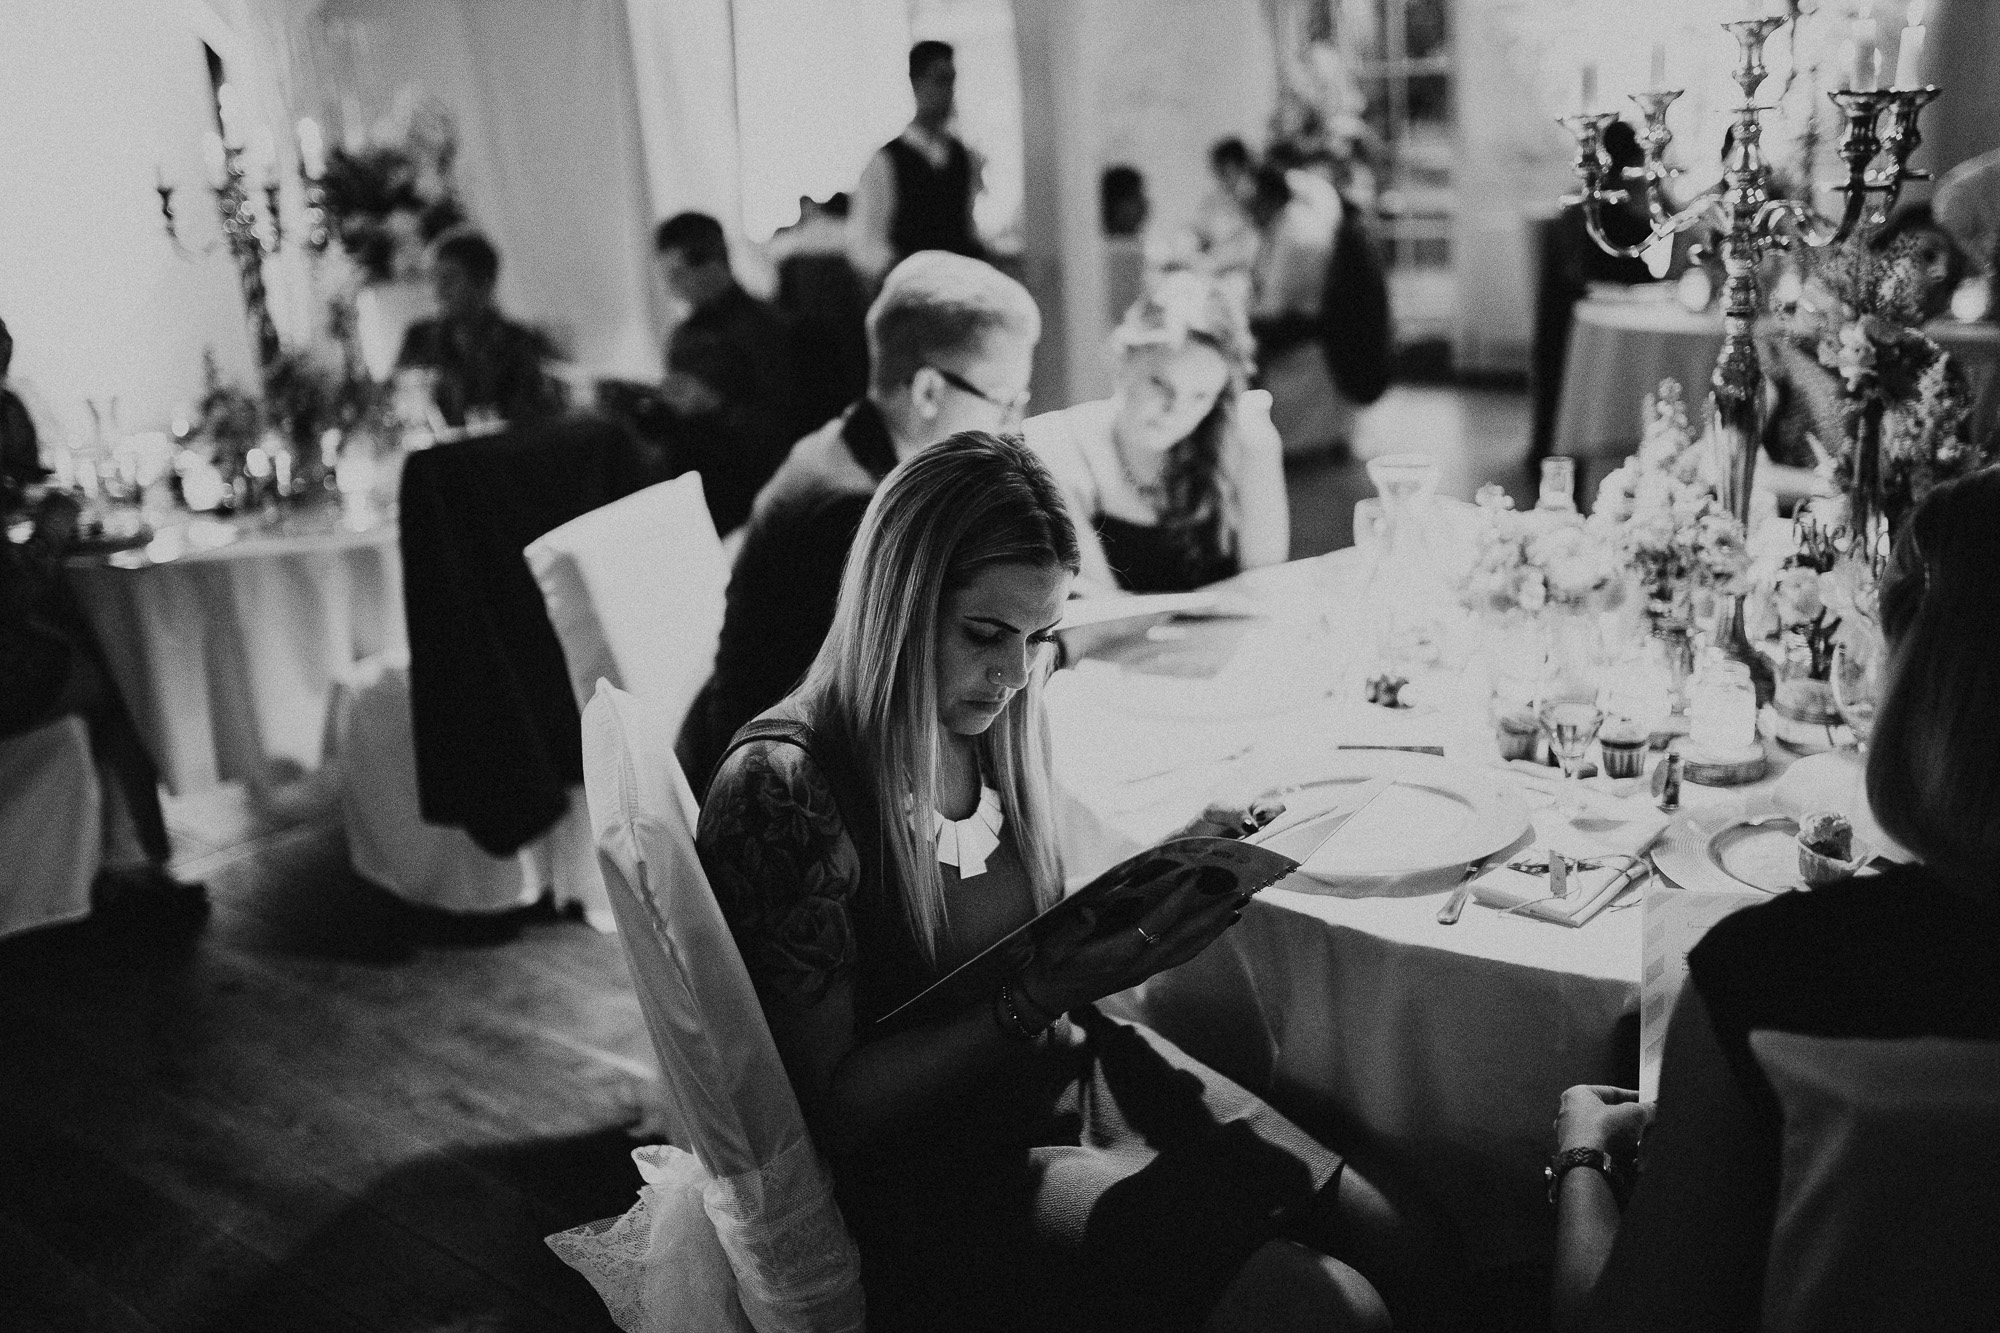 DanielaMarquardtPhotography_Hochzeitsfotograf_Düsseldorf_Köln_Mallorca_Bayern_Austria_Harz_Wedding_AileenundLennart_Weddingphotographer_Ibiza_Tuskany_Italien_Toskana_Portugal_Lissabon260